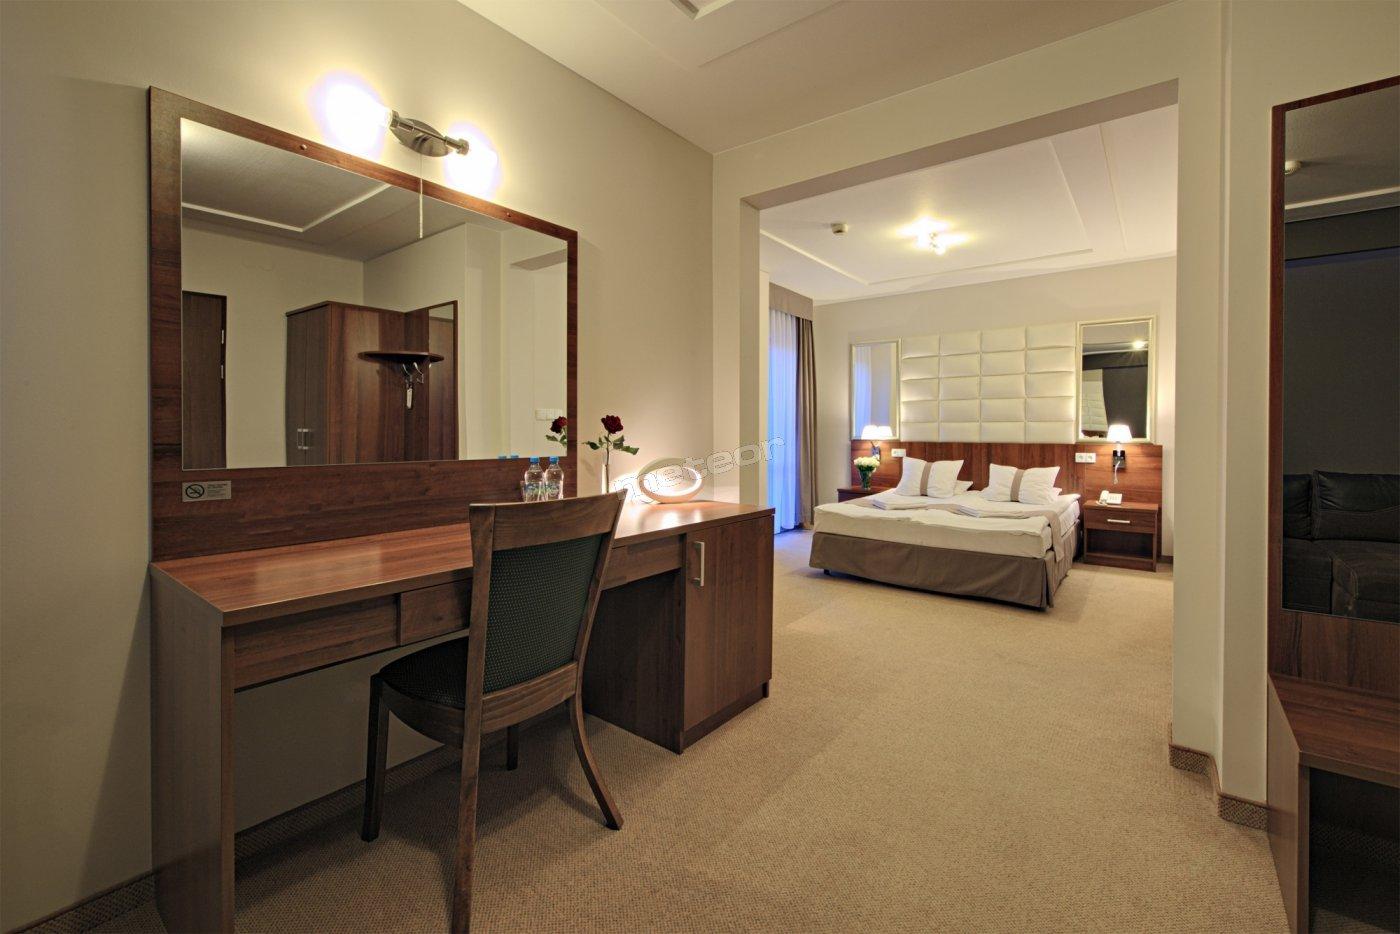 Apartament_Komfort_Hotel_Piaskowy